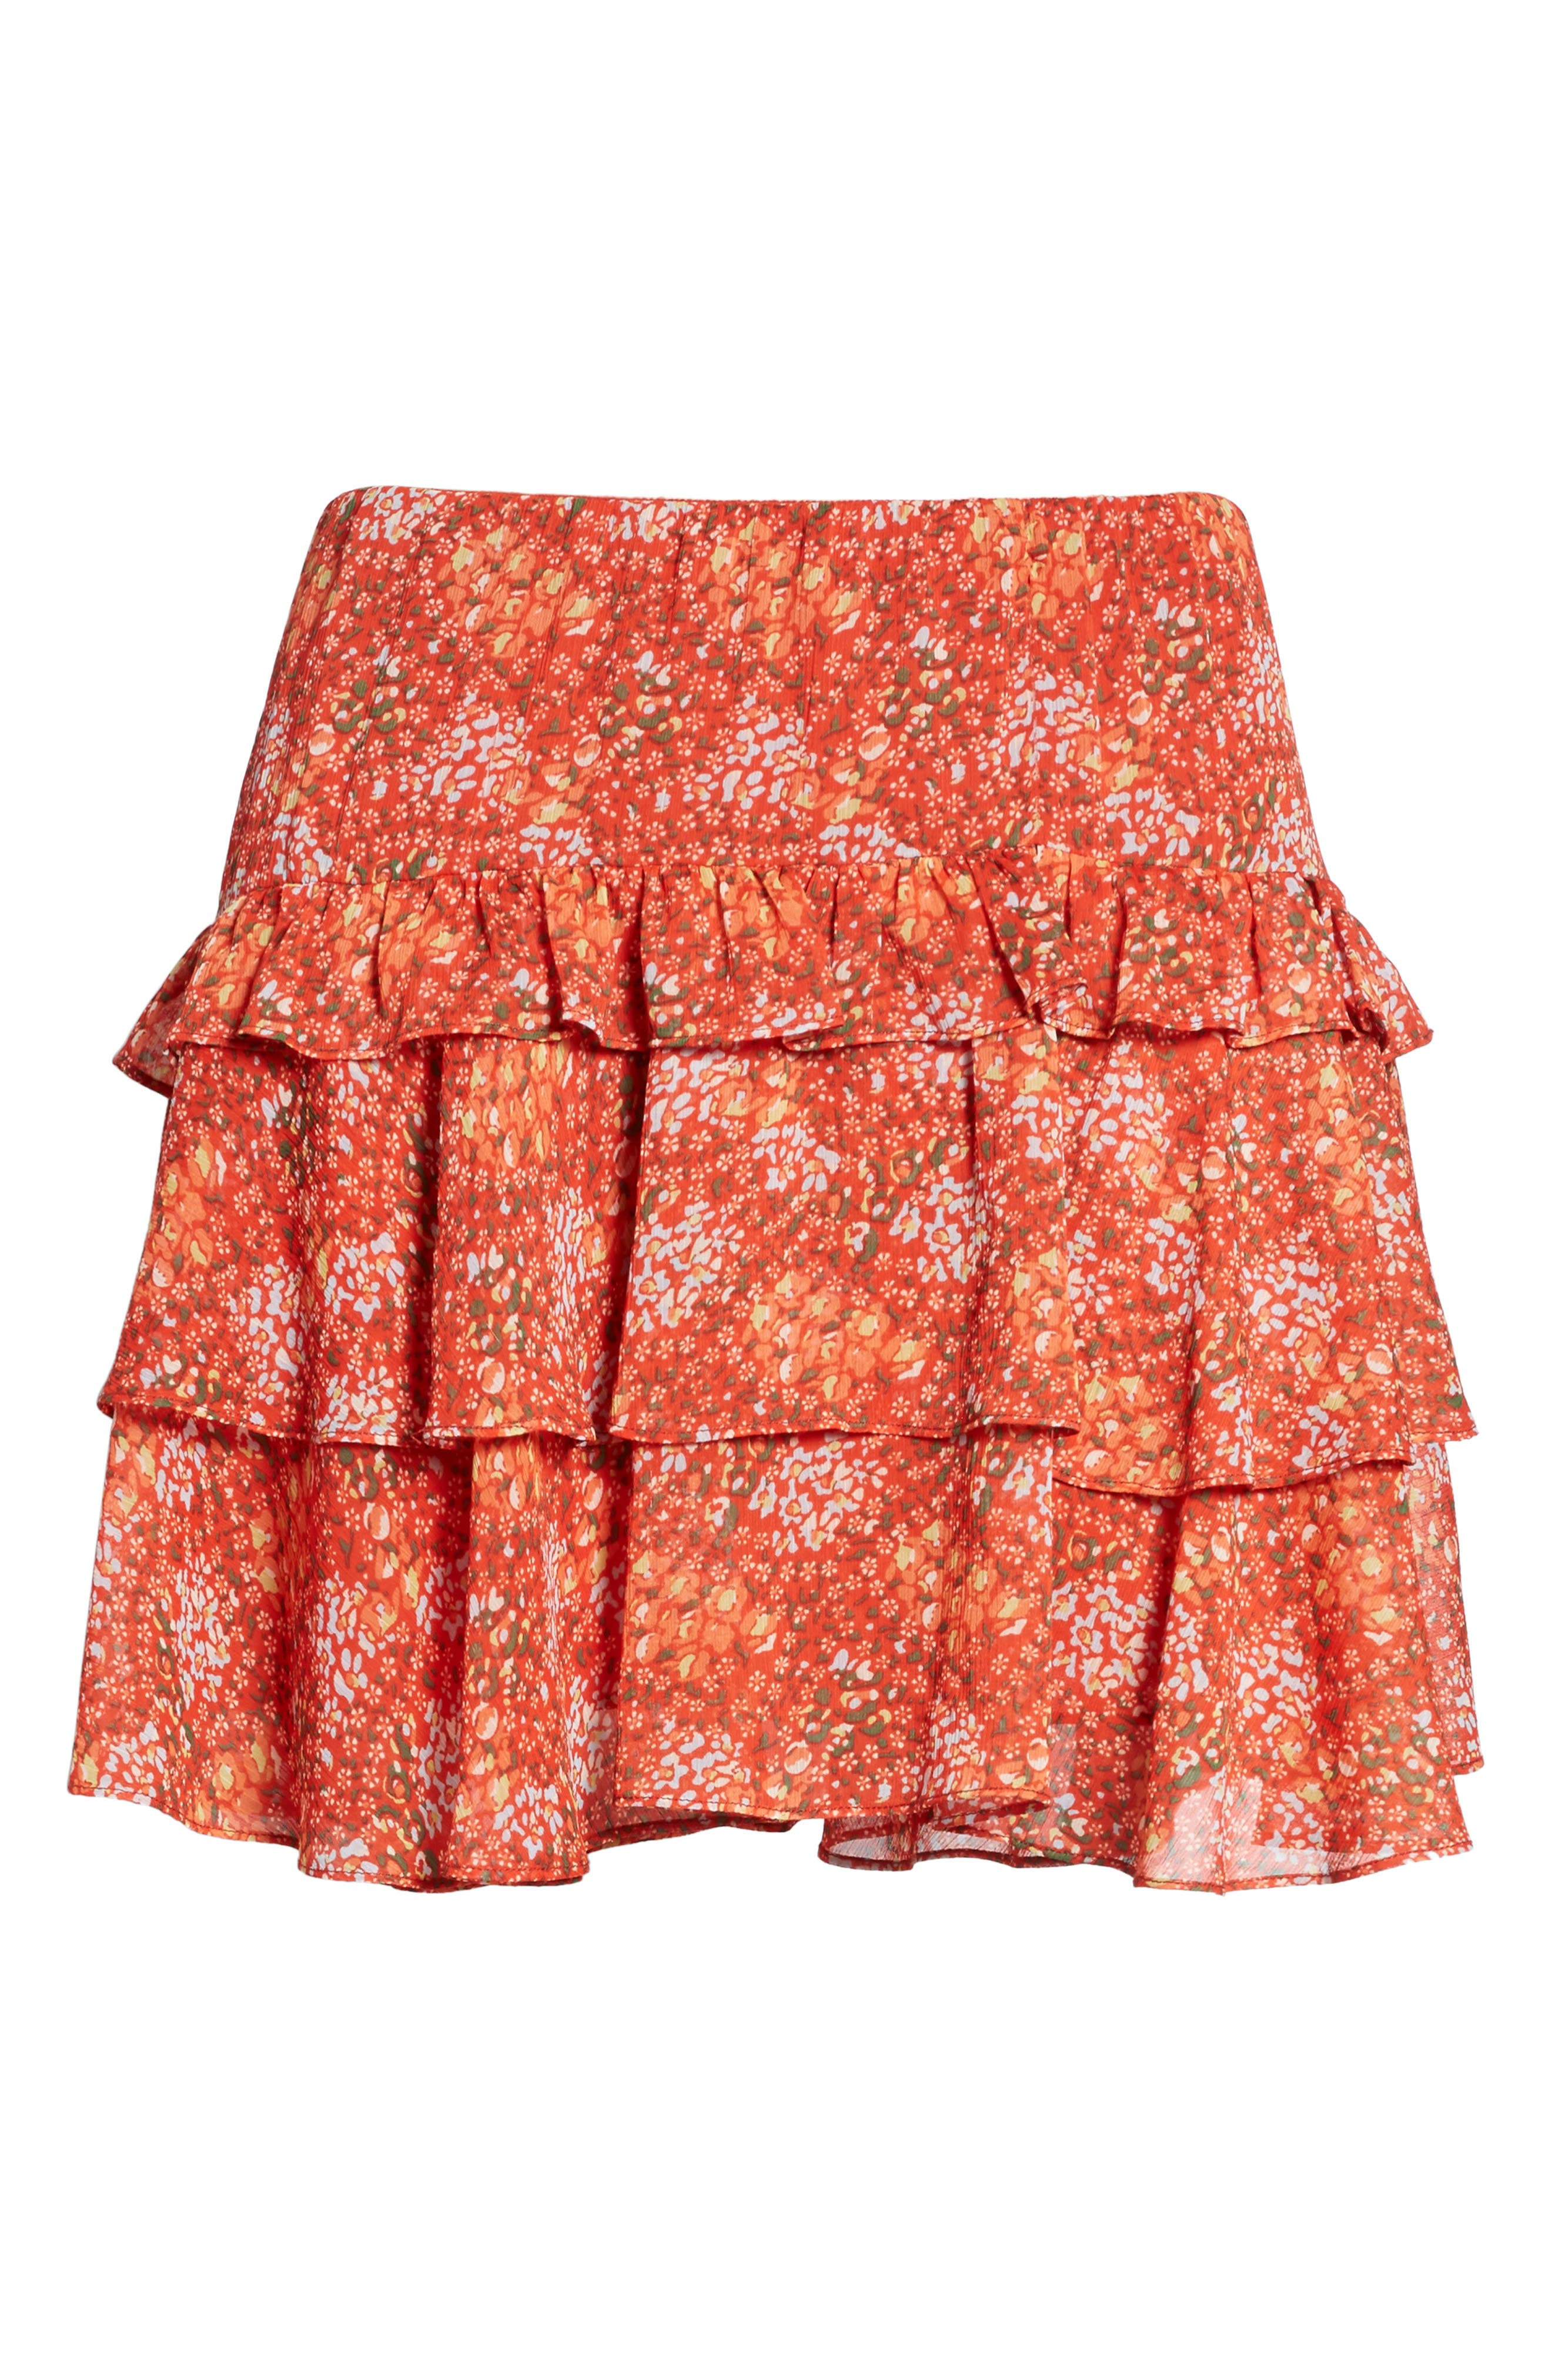 Phoebe Ruffle Tier Skirt,                             Alternate thumbnail 6, color,                             Red Multi